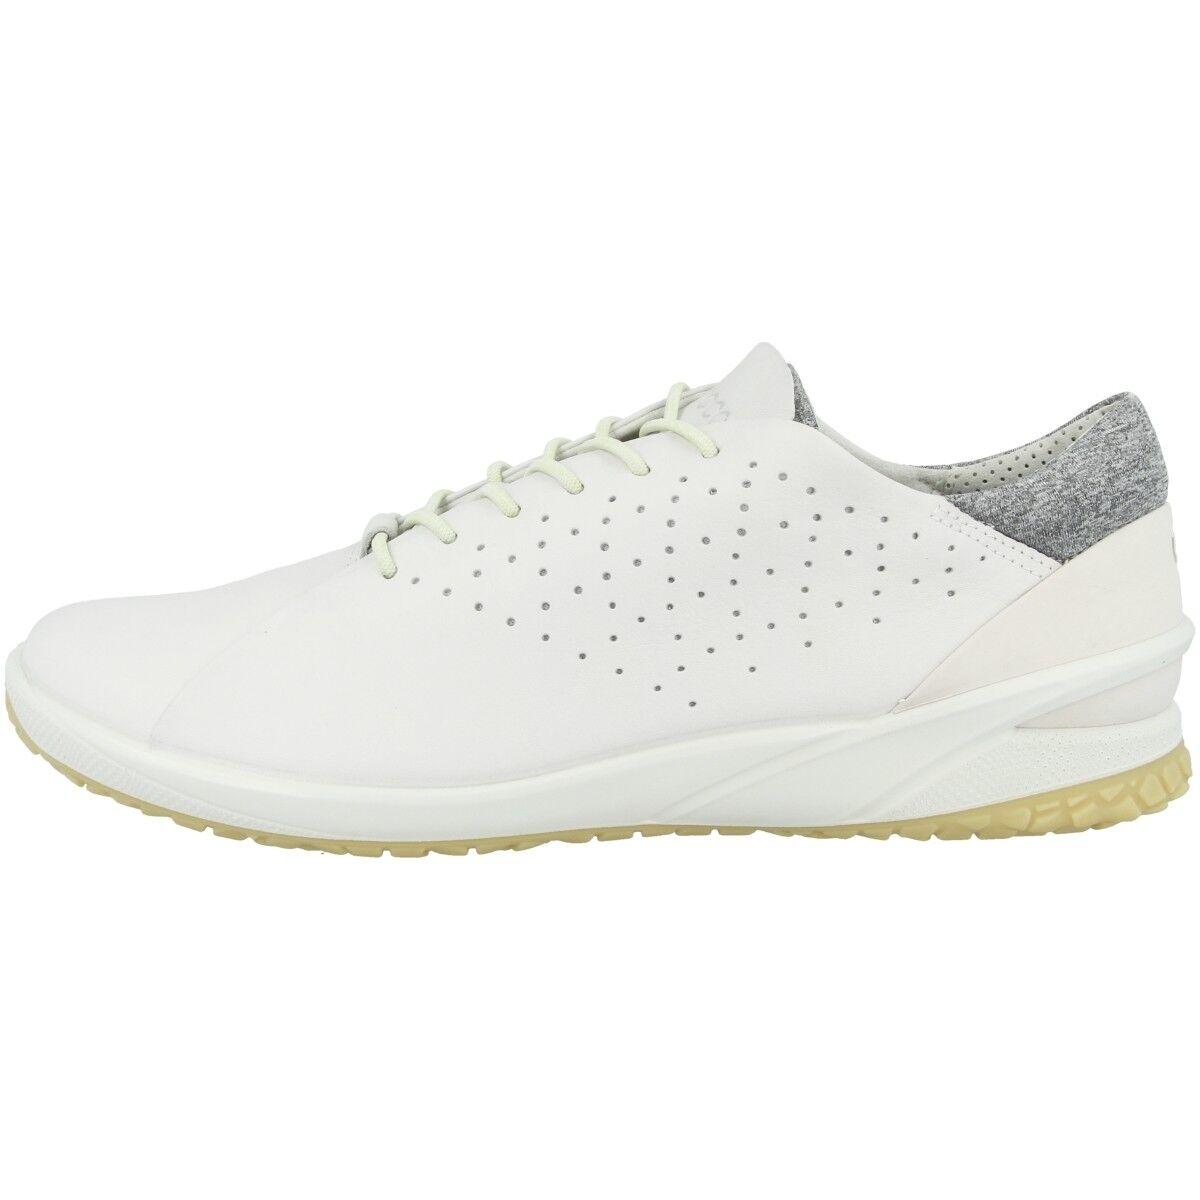 Ecco Ecco Ecco Biom Vie Chaussures Naturel Mouvement Femmes baskets Blanc 880313-01007 7371eb